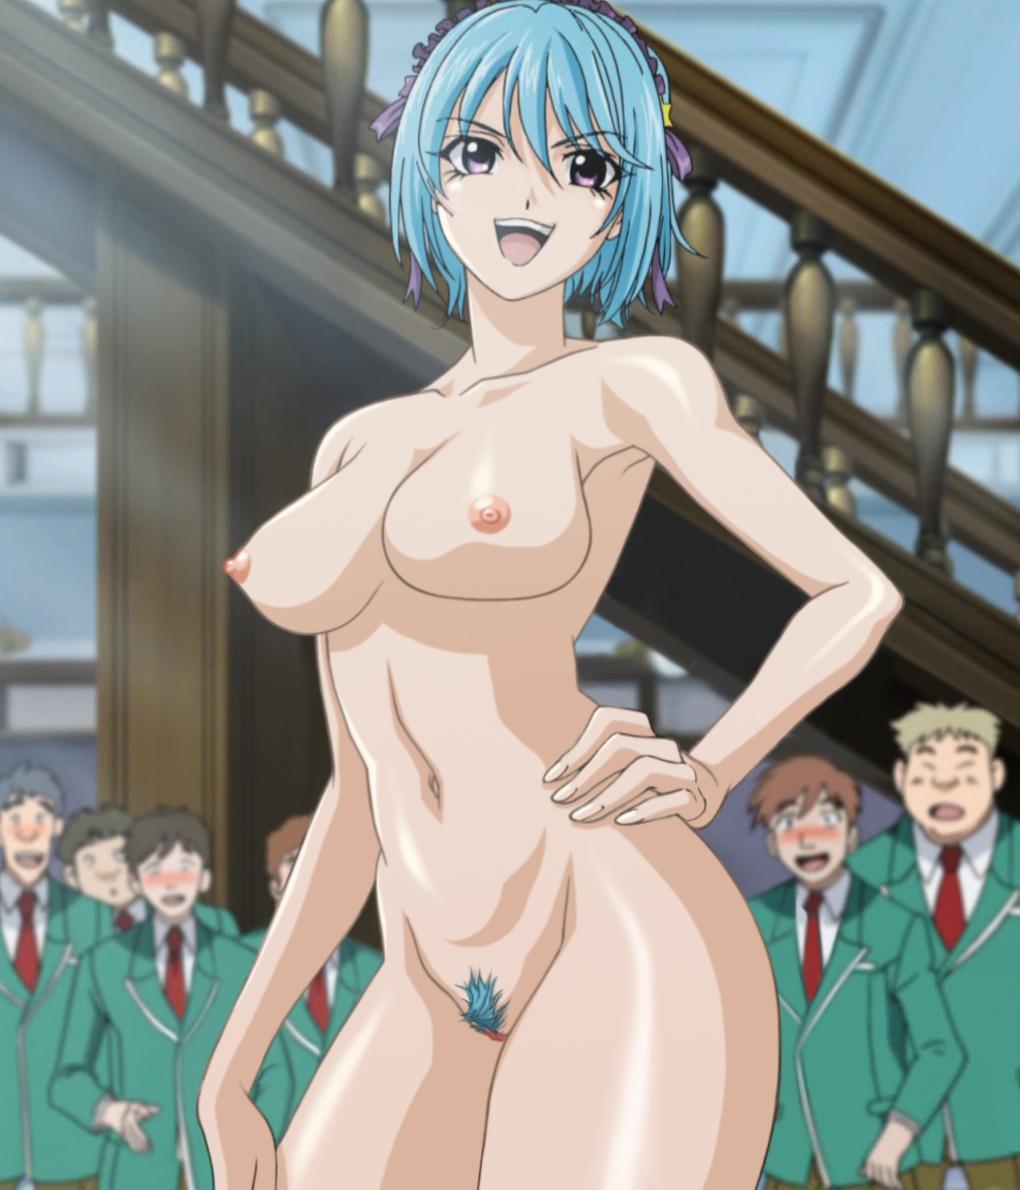 Anime vampir porno 3d sex tube